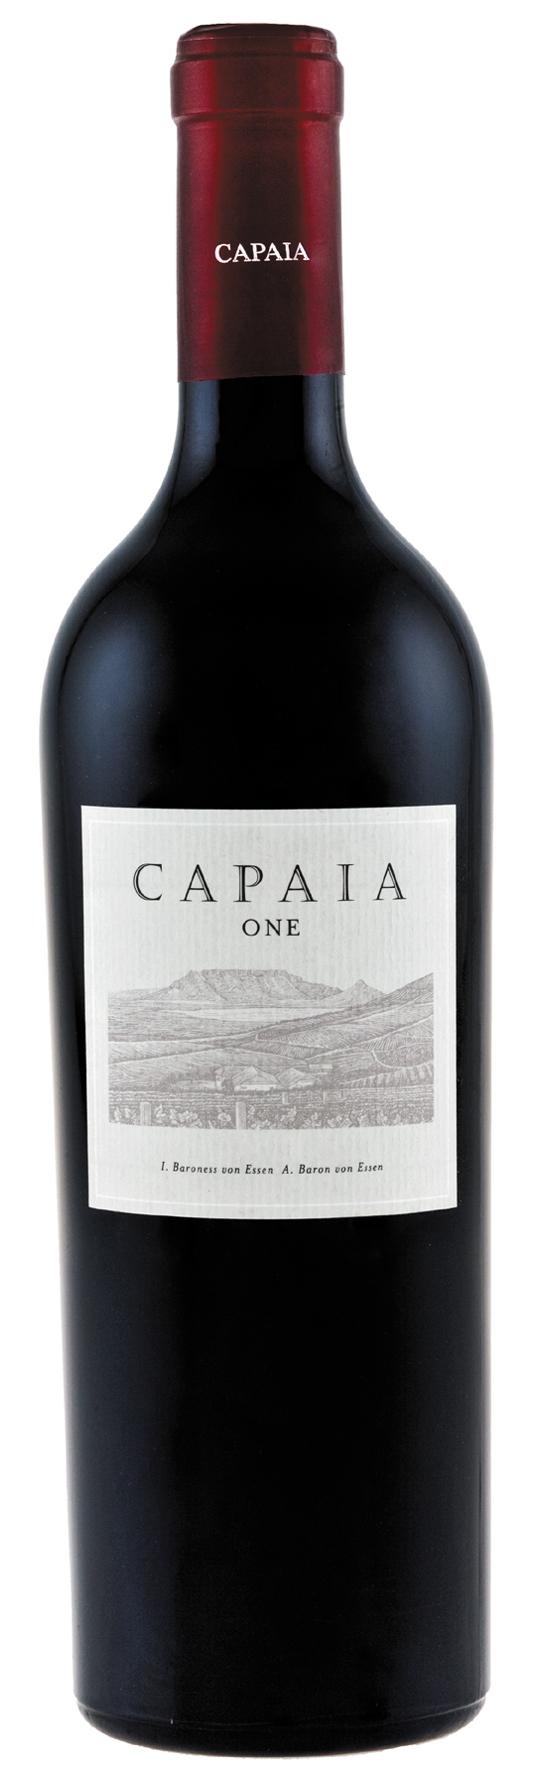 CAPAIA ONE 2009er